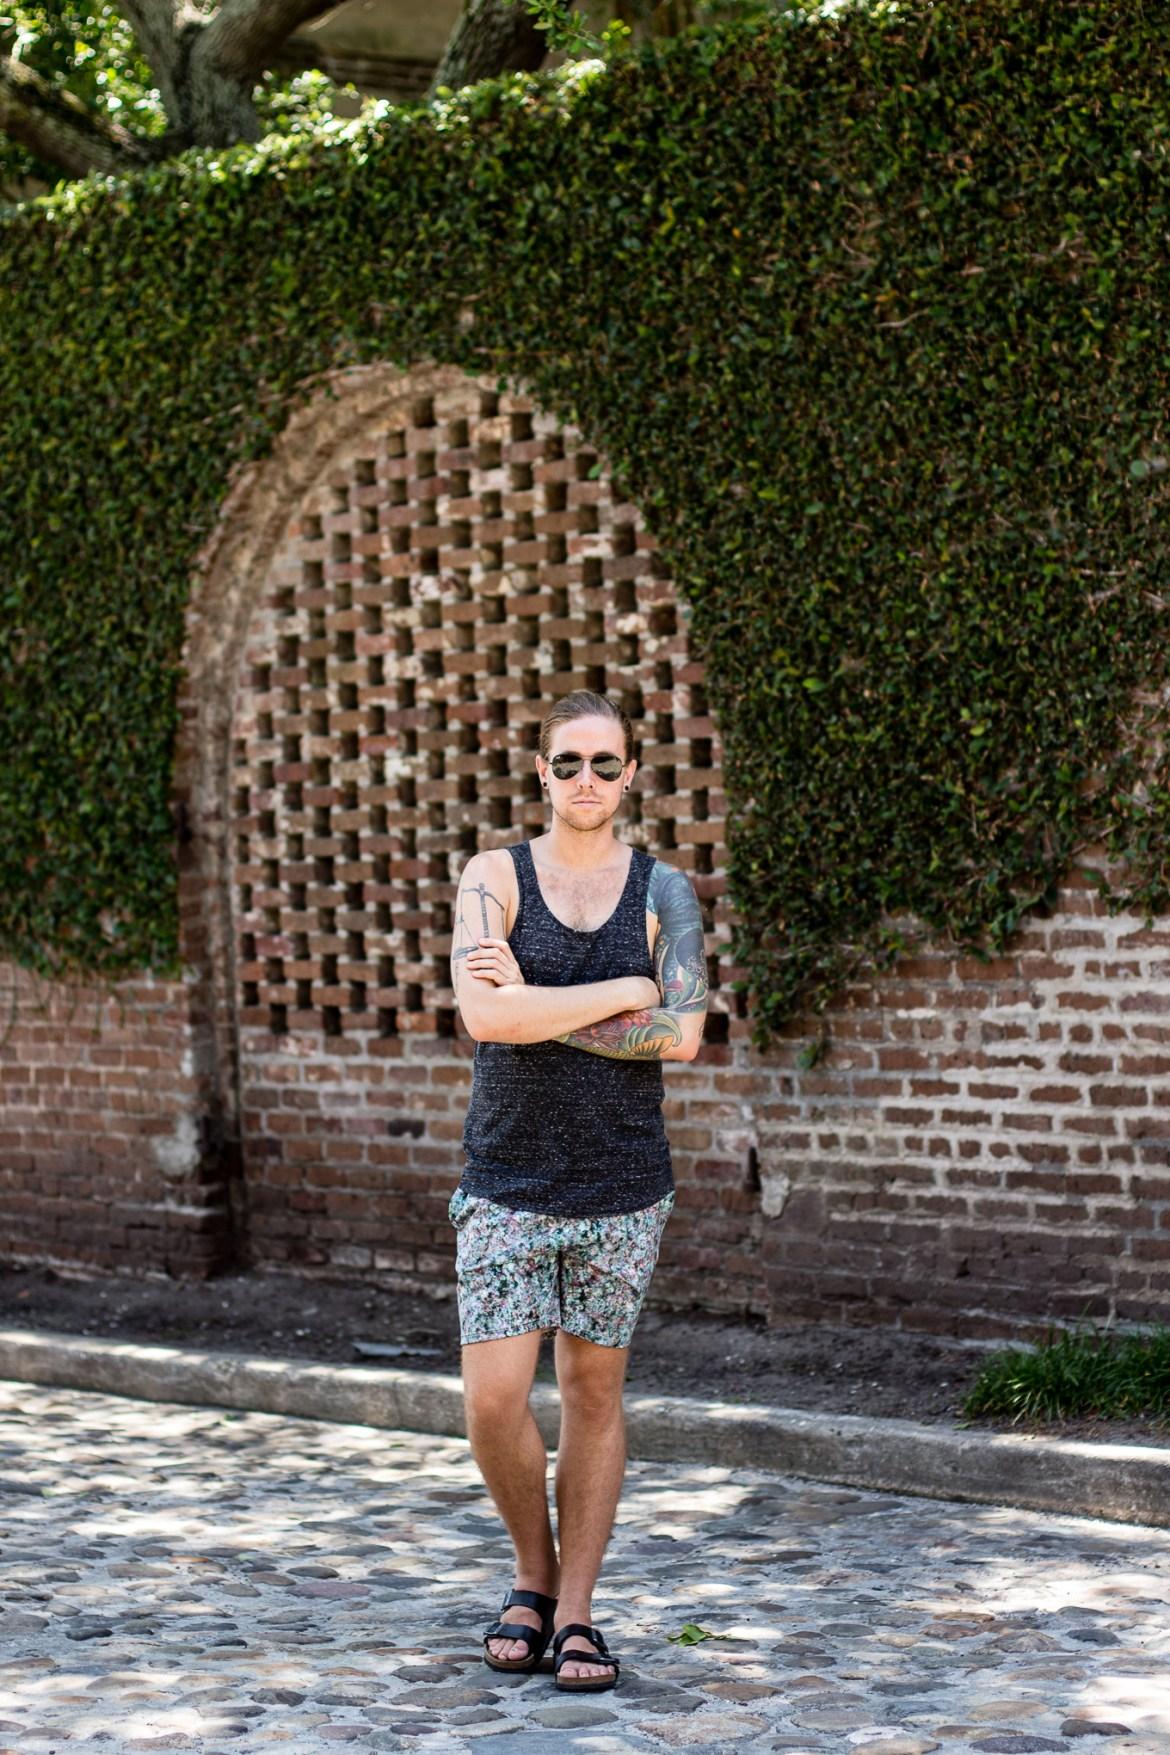 hm mens tank top, topman shorts, summer mens fashion, mens birkenstock sandals, rainbow row charleston